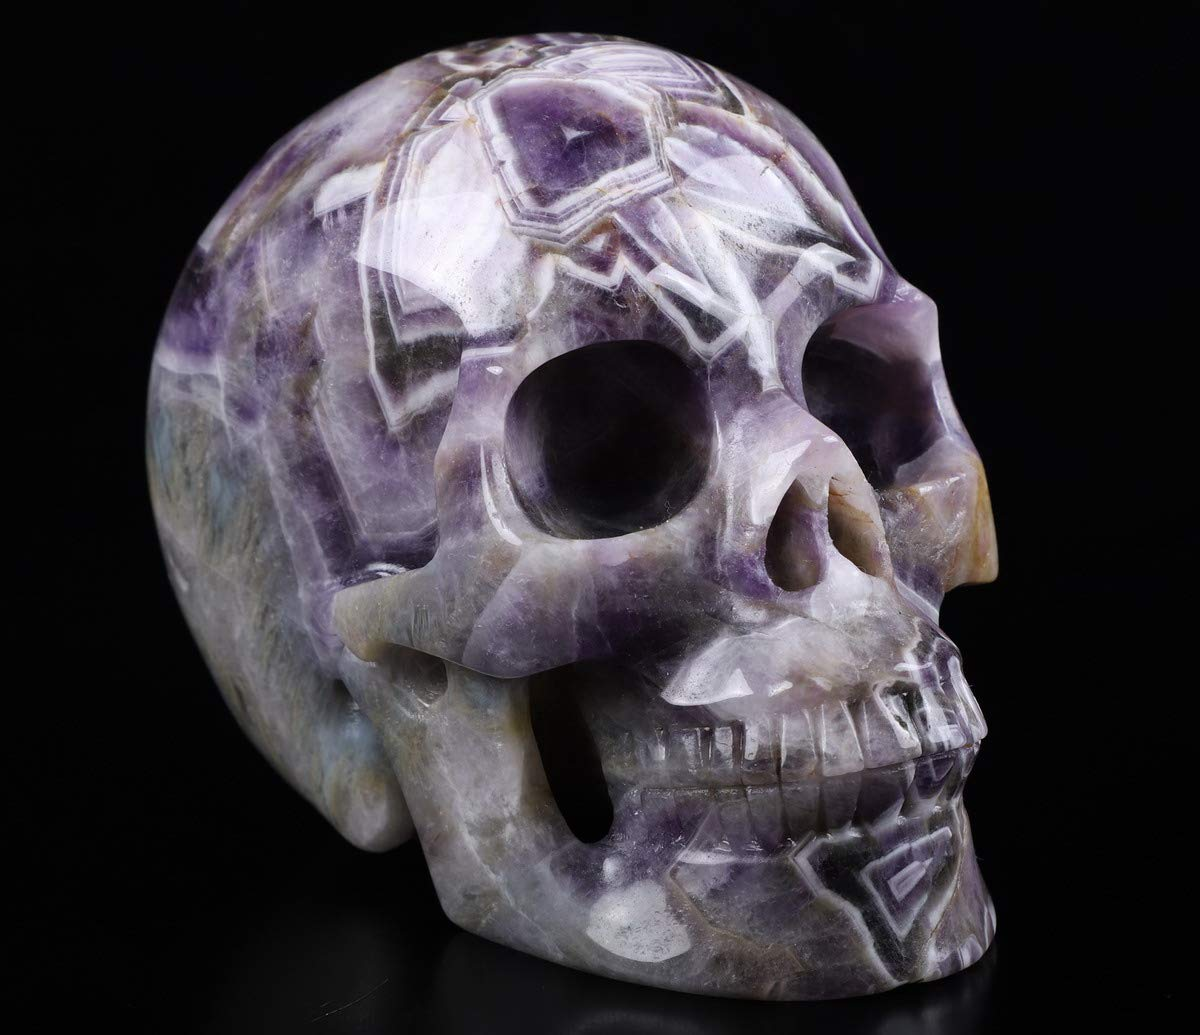 Skullis 5.0 Dream Chevron Amethyst Crystal Skull, Hand Carved Gemstone Fine Art Sculpture, Reiki Healing Stone Statue.